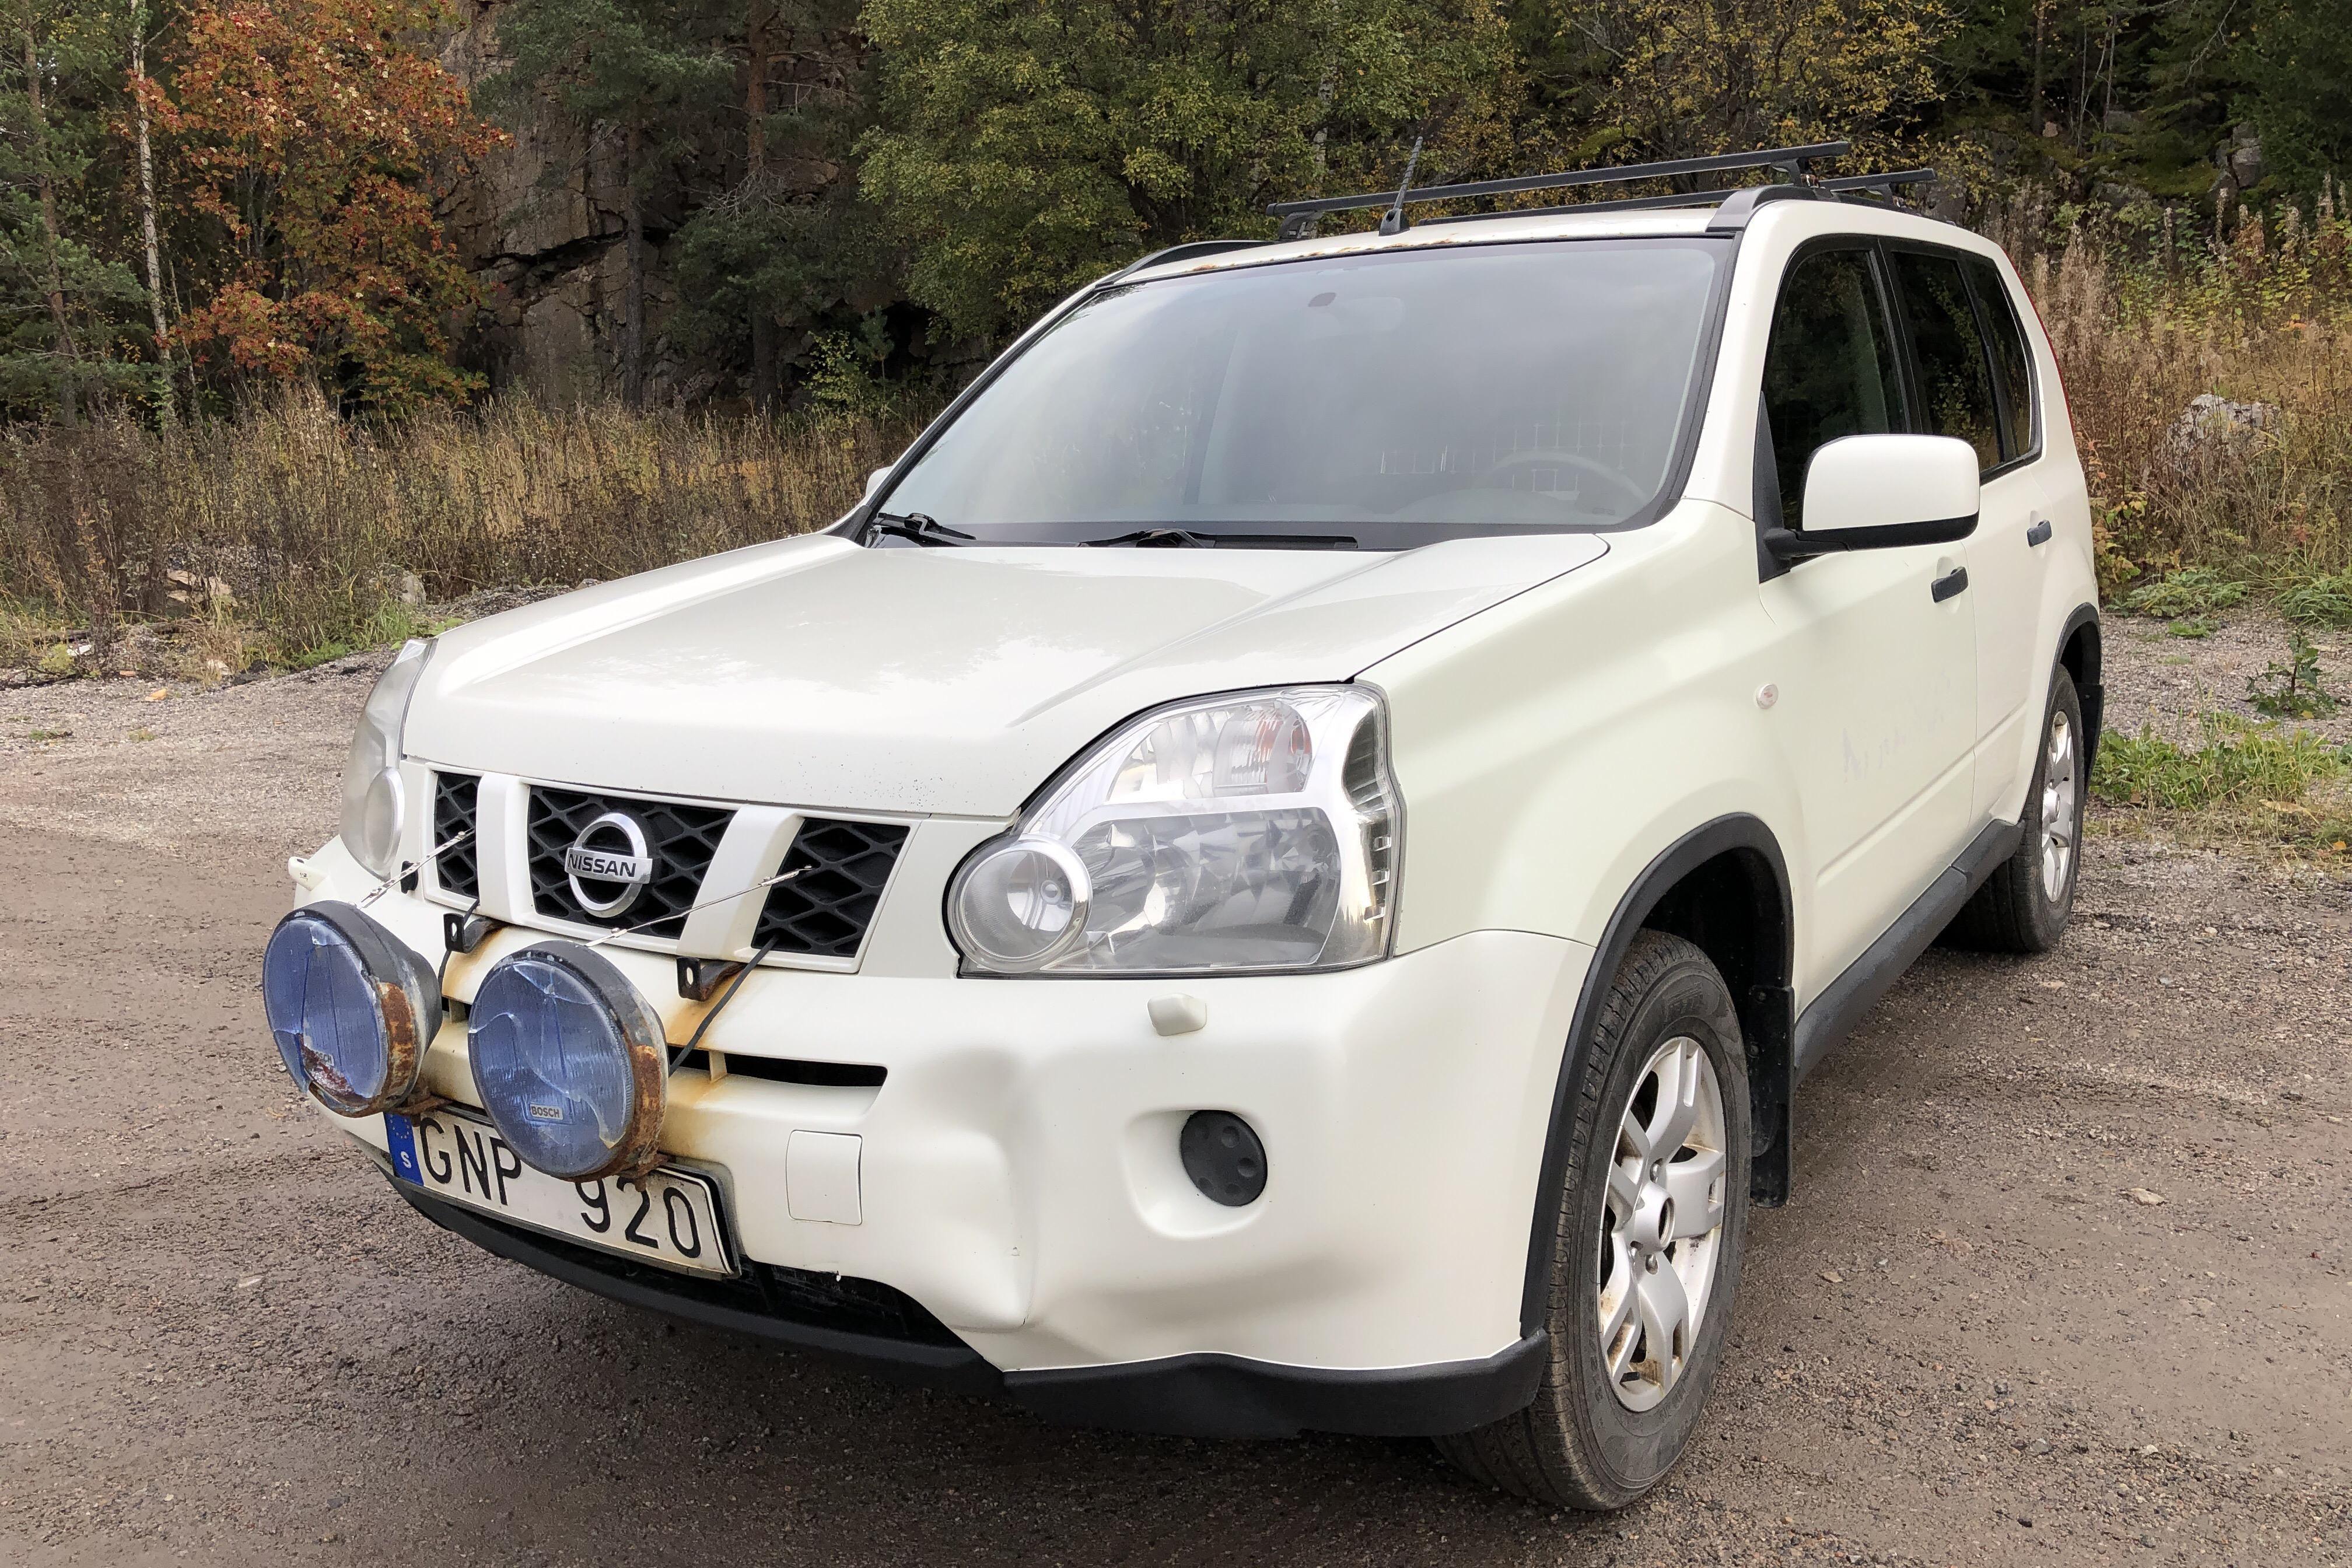 Nissan X-trail 2.0 dCi (150hk)